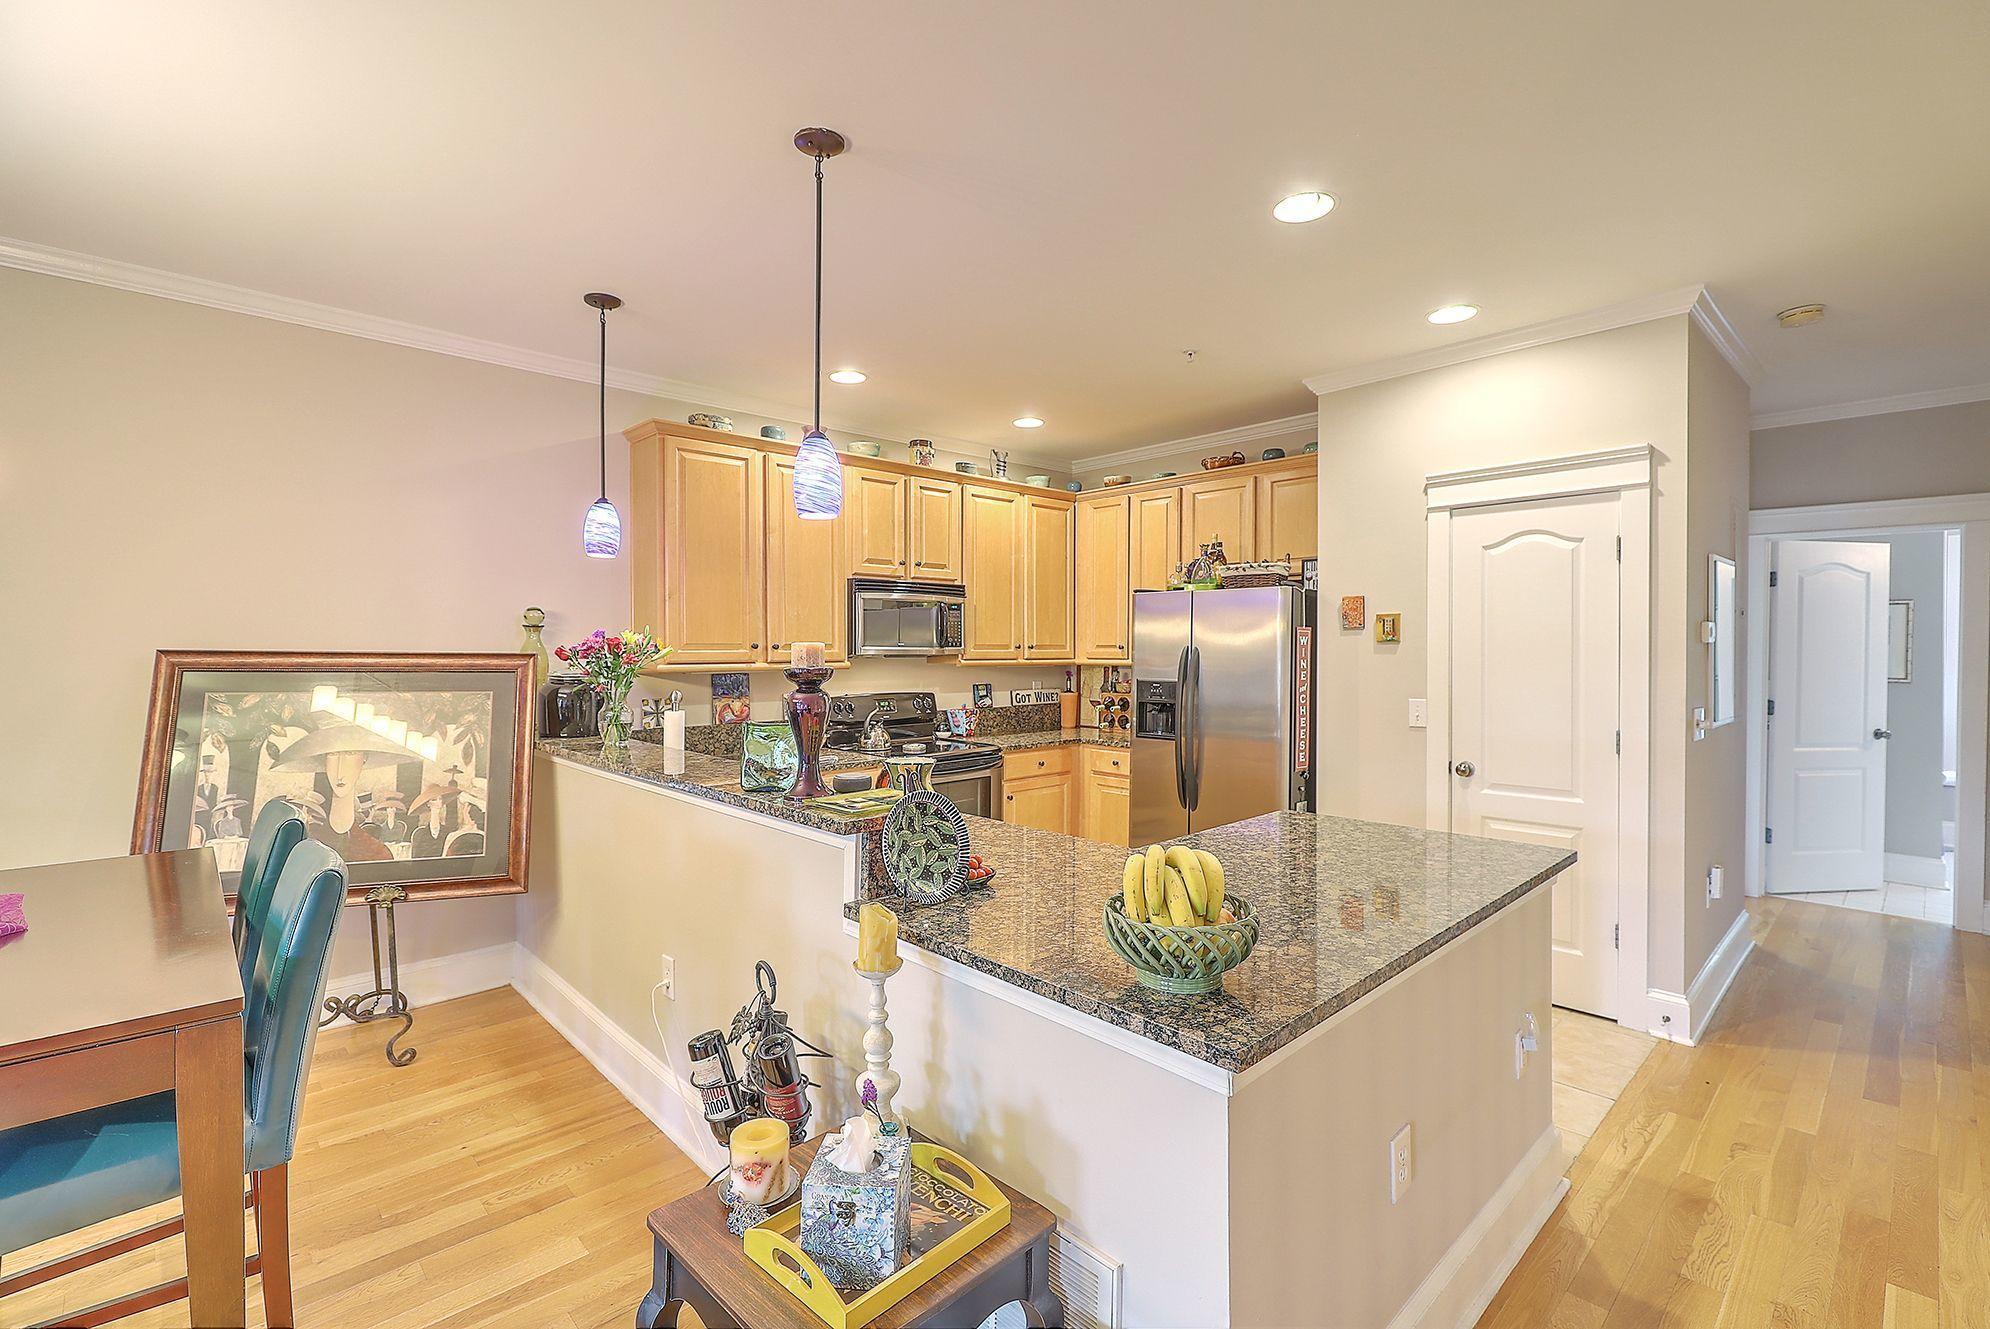 Etiwan Pointe Homes For Sale - 208 Etiwan Pointe, Mount Pleasant, SC - 29